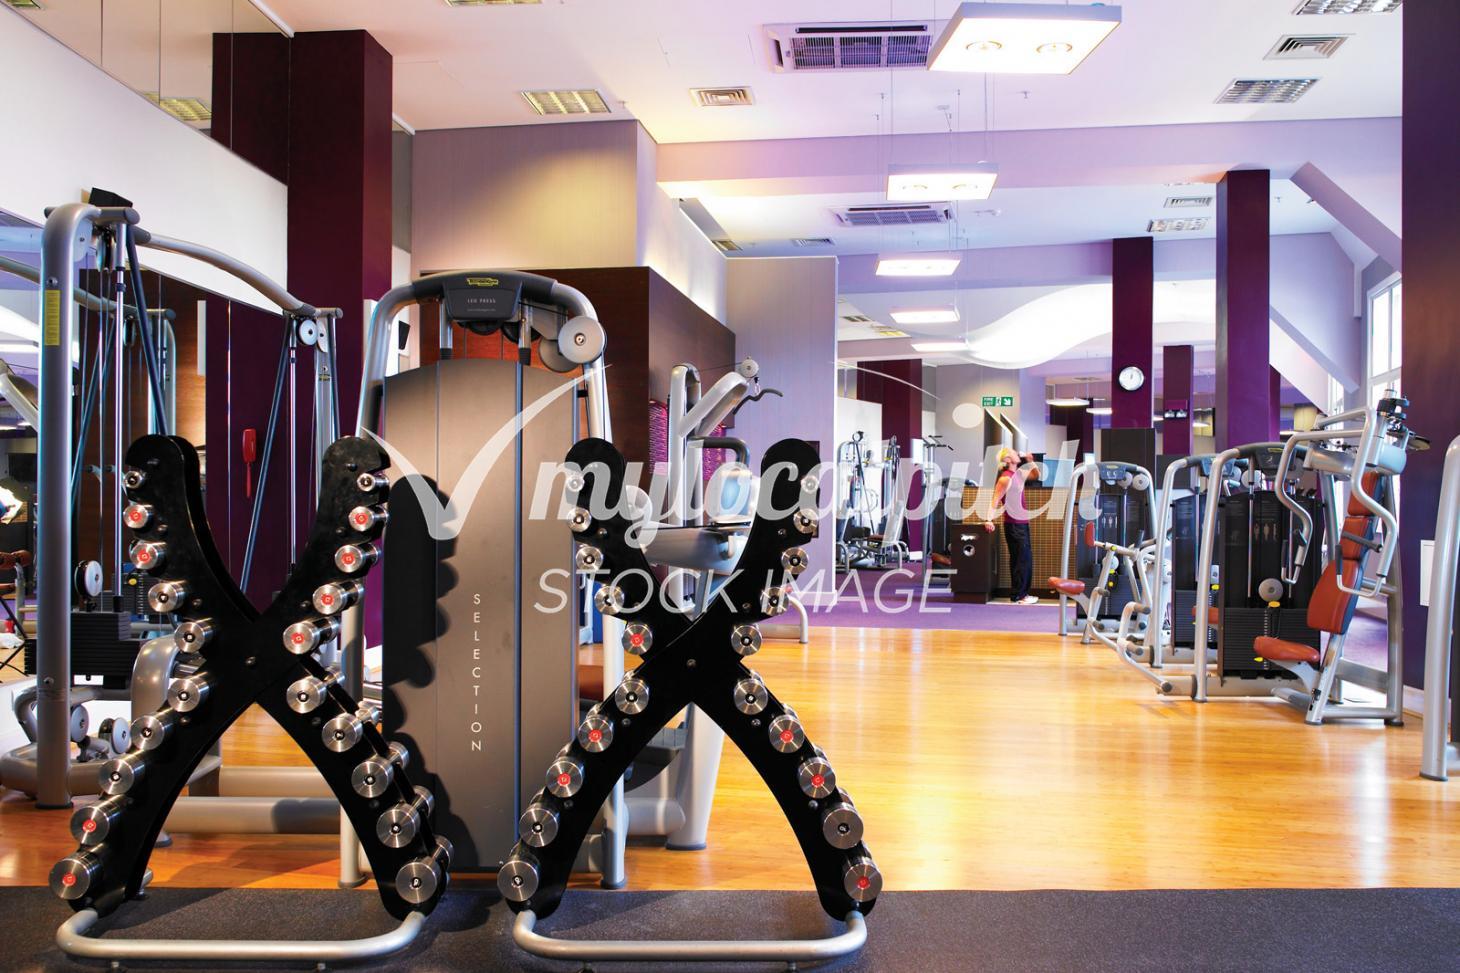 Ironmonger Row Baths Gym gym